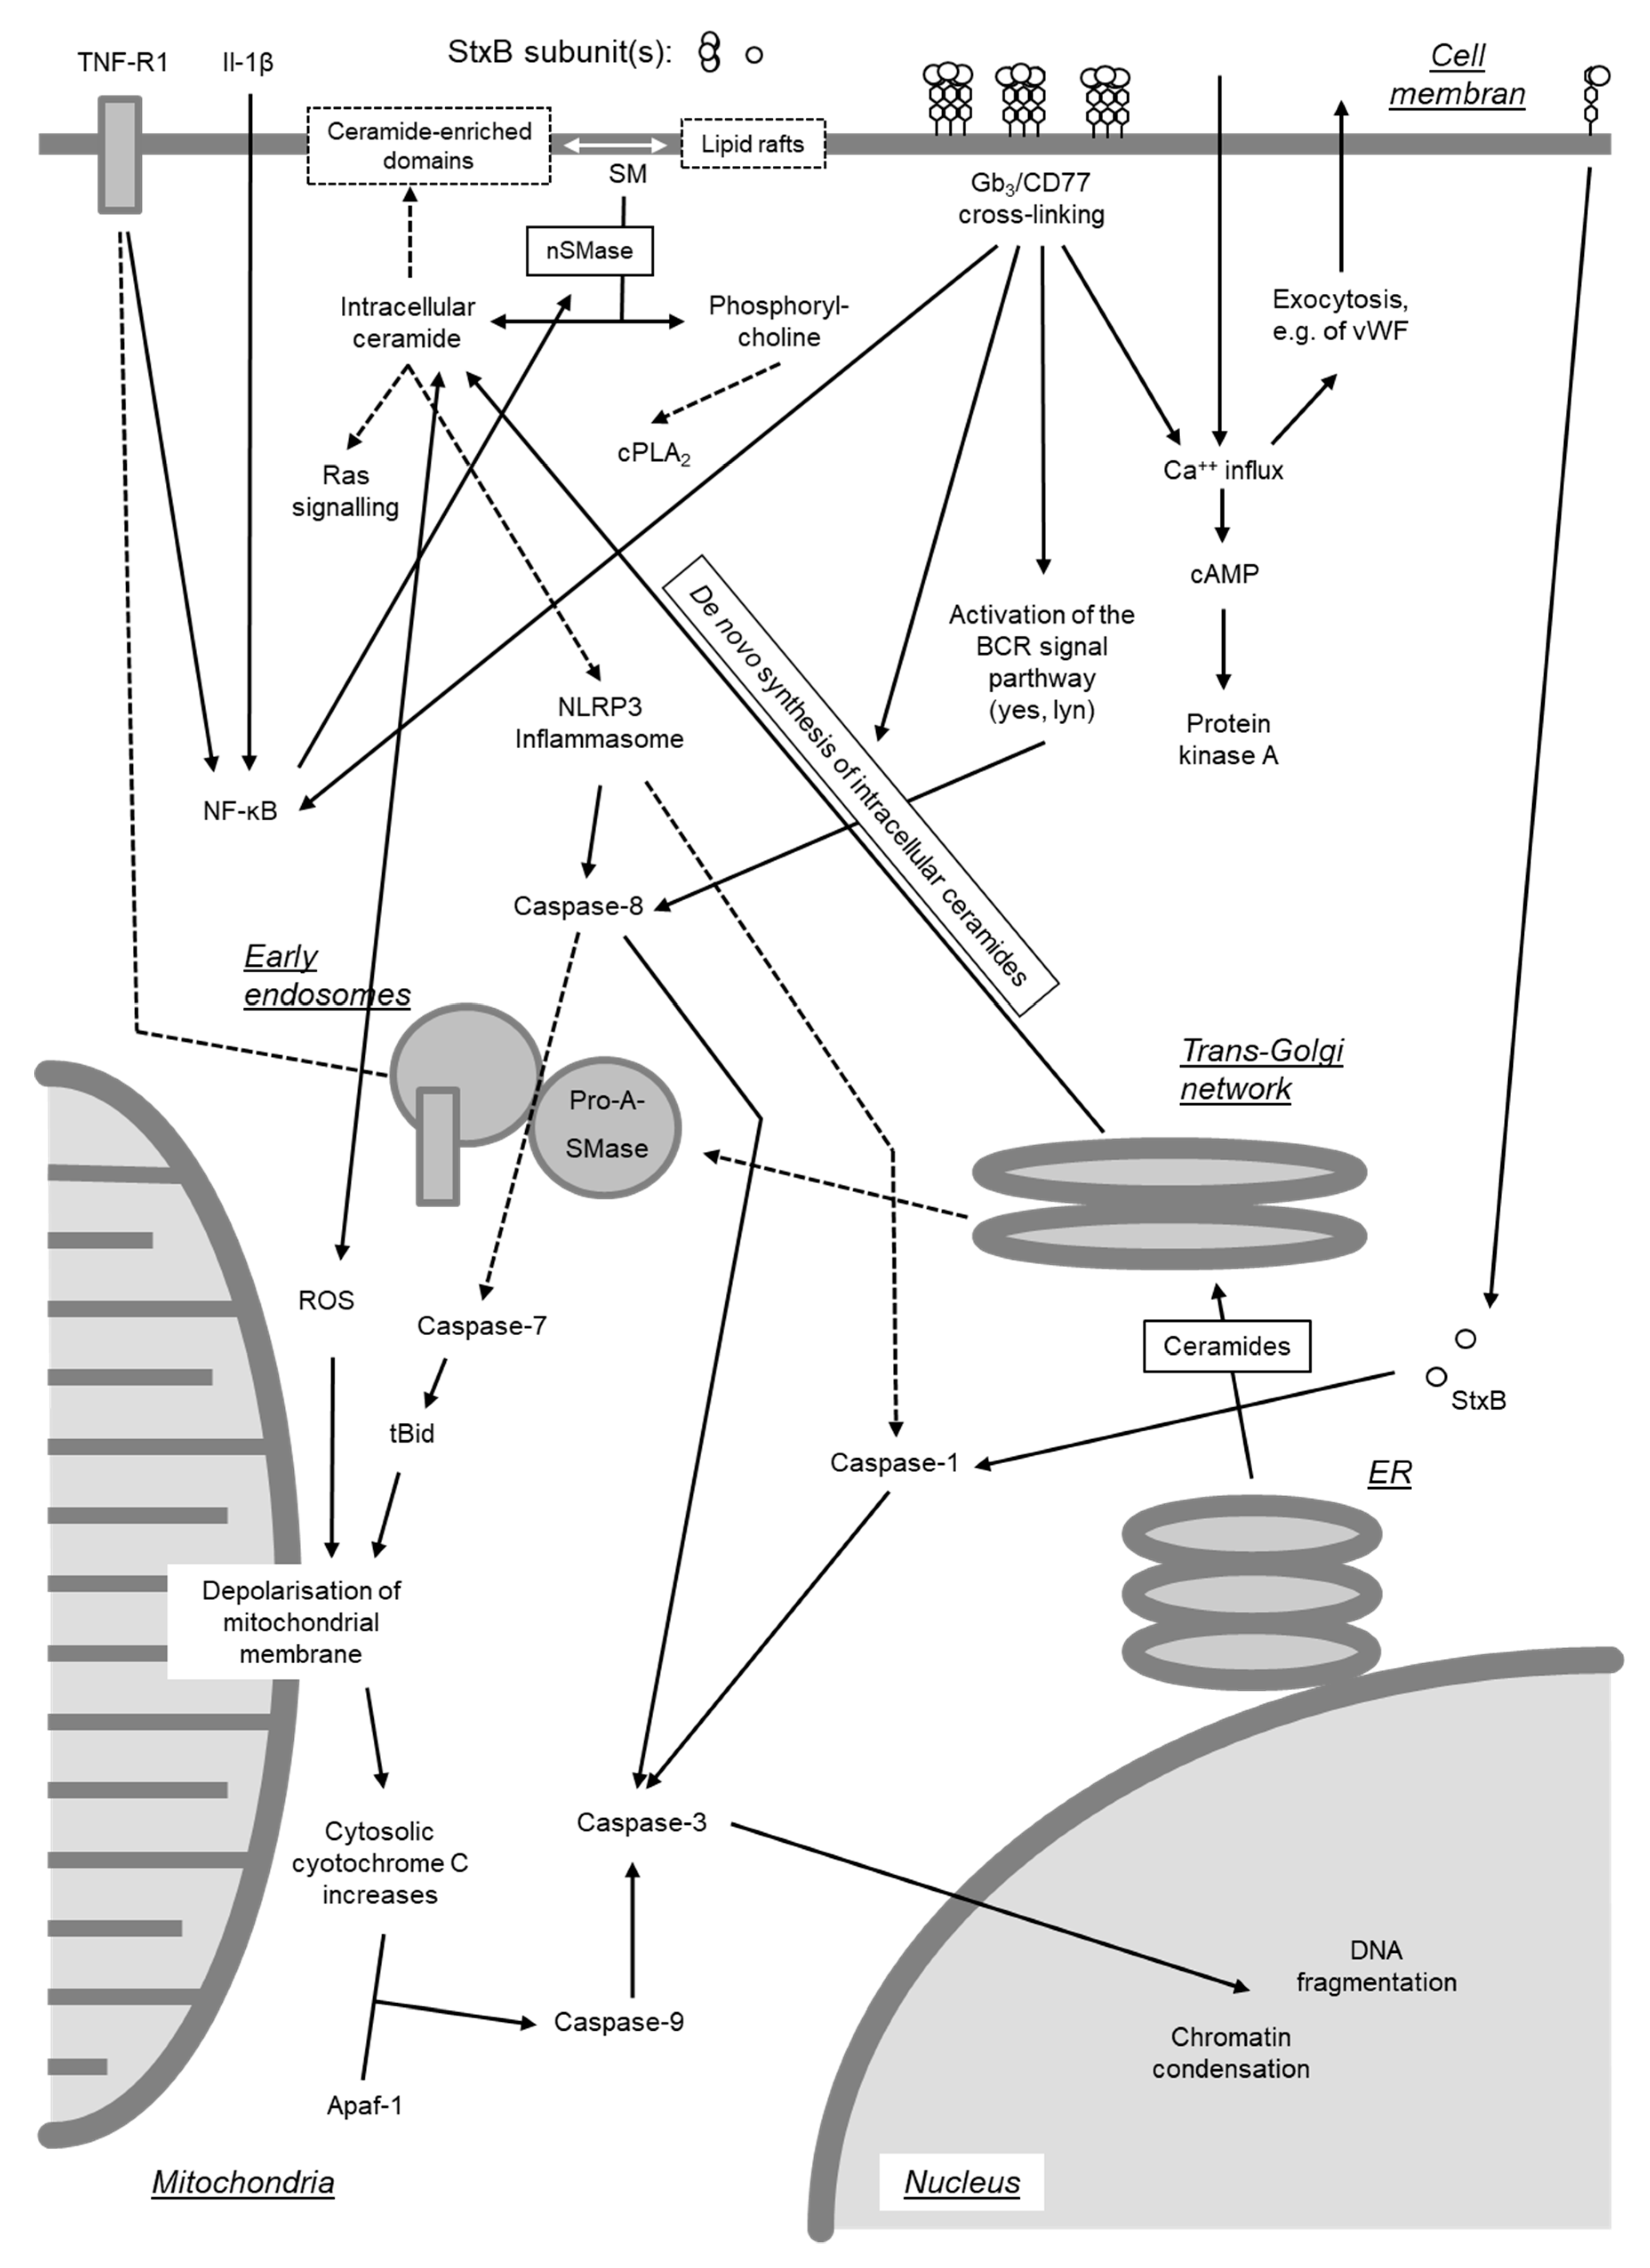 Toxins Free Full Text Molecular Biology Of Escherichia Coli Shiga Toxins Effects On Mammalian Cells Html